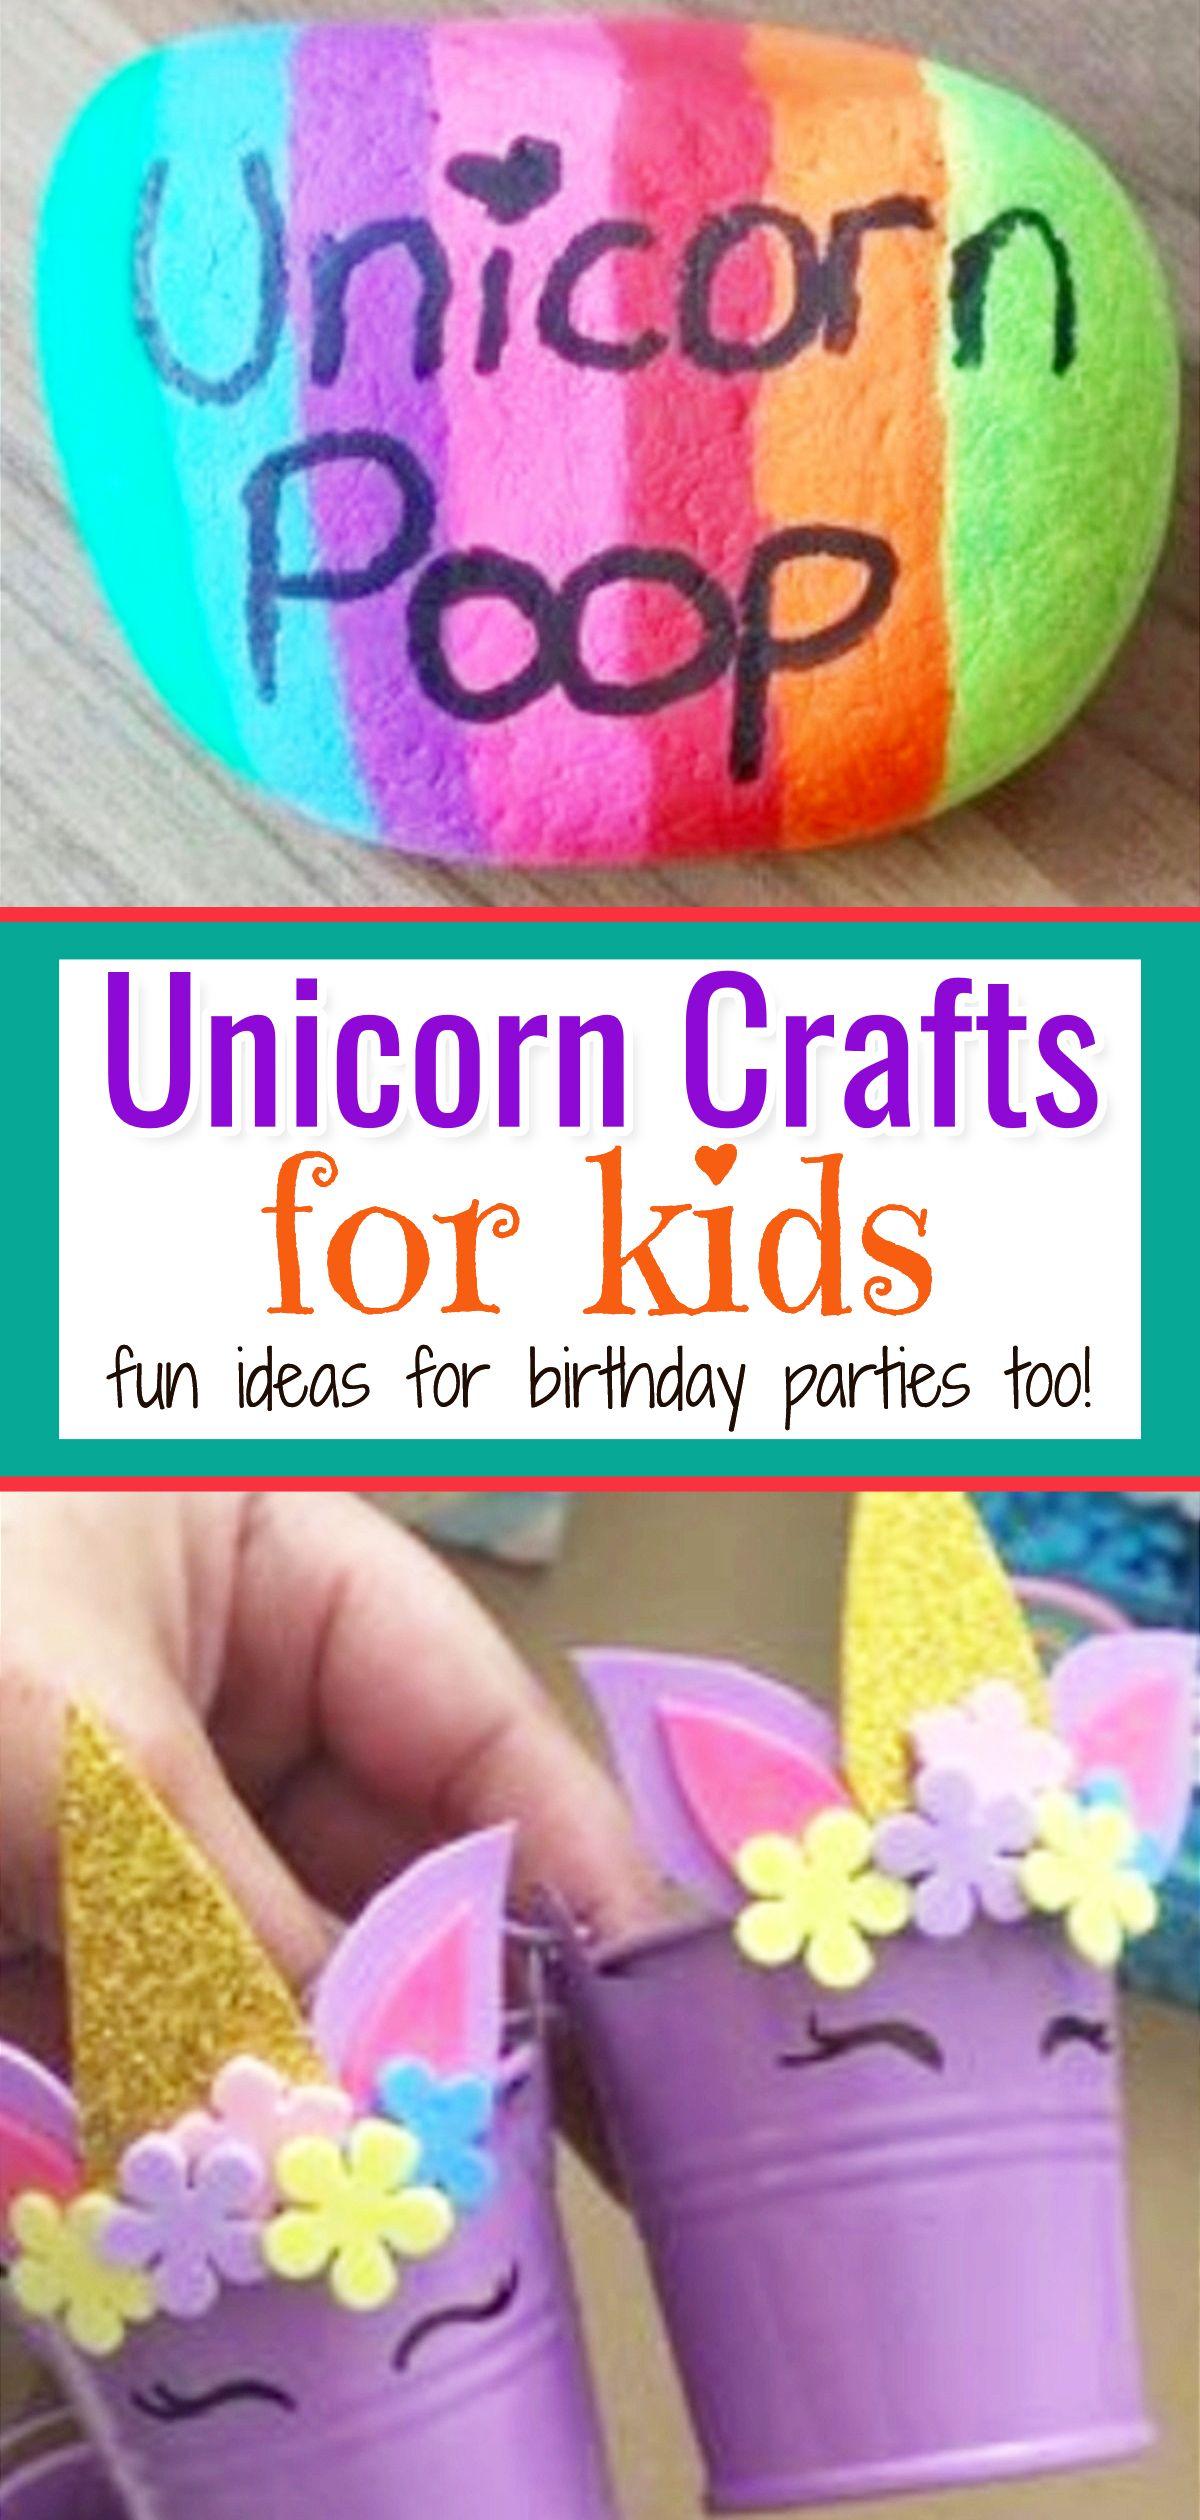 Unicorn Crafts For Kids Cute Easy Diy Unicorn Craft Ideas Clever Diy Ideas Kids Crafts Summertime Unicorn Crafts Craft Projects For Kids